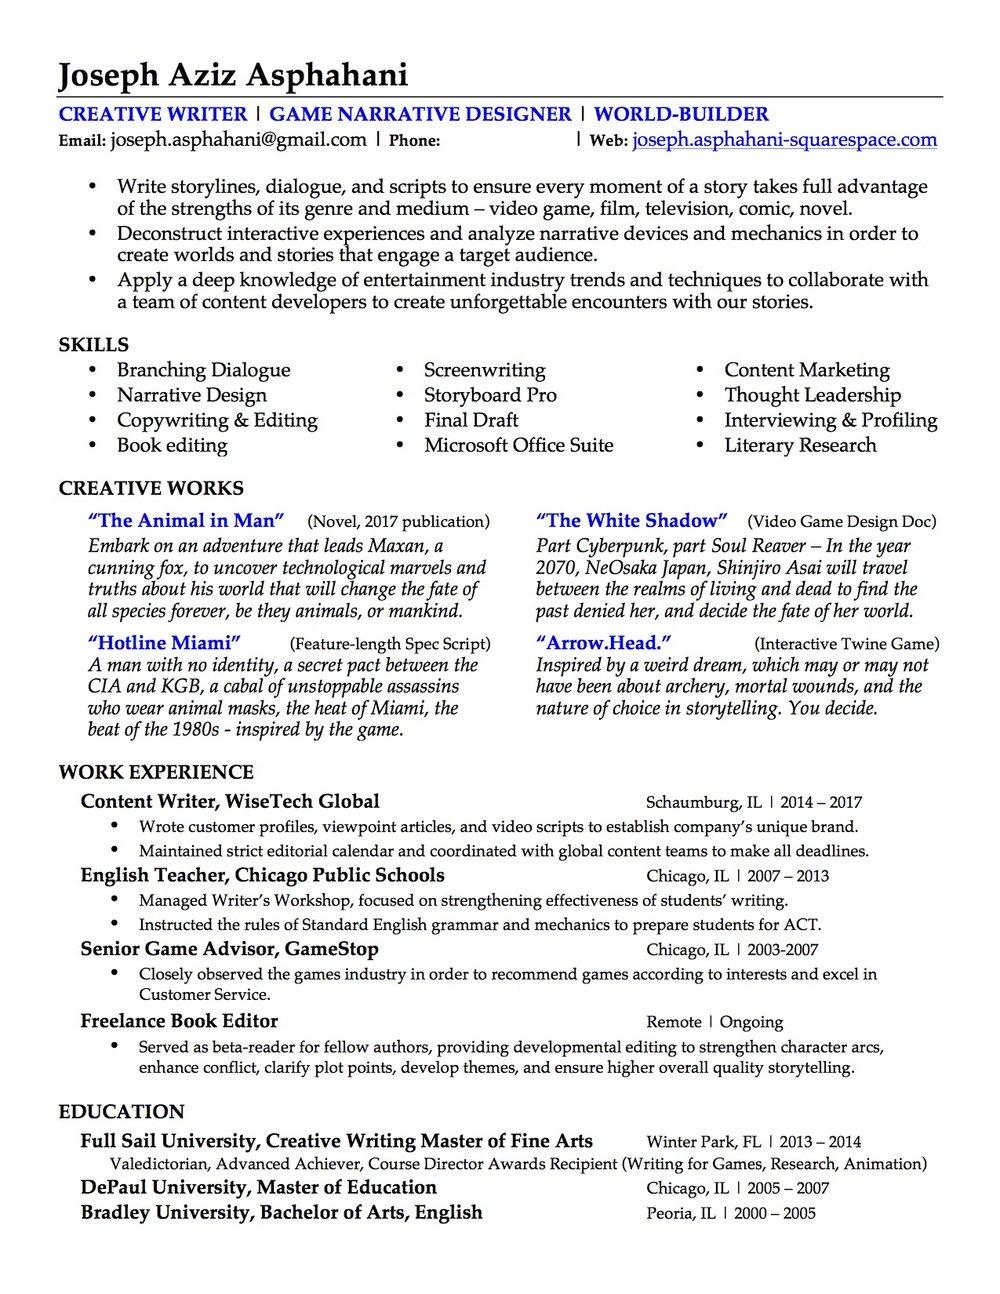 Joseph Asphahani - Game Portfolio Site Resume.jpg